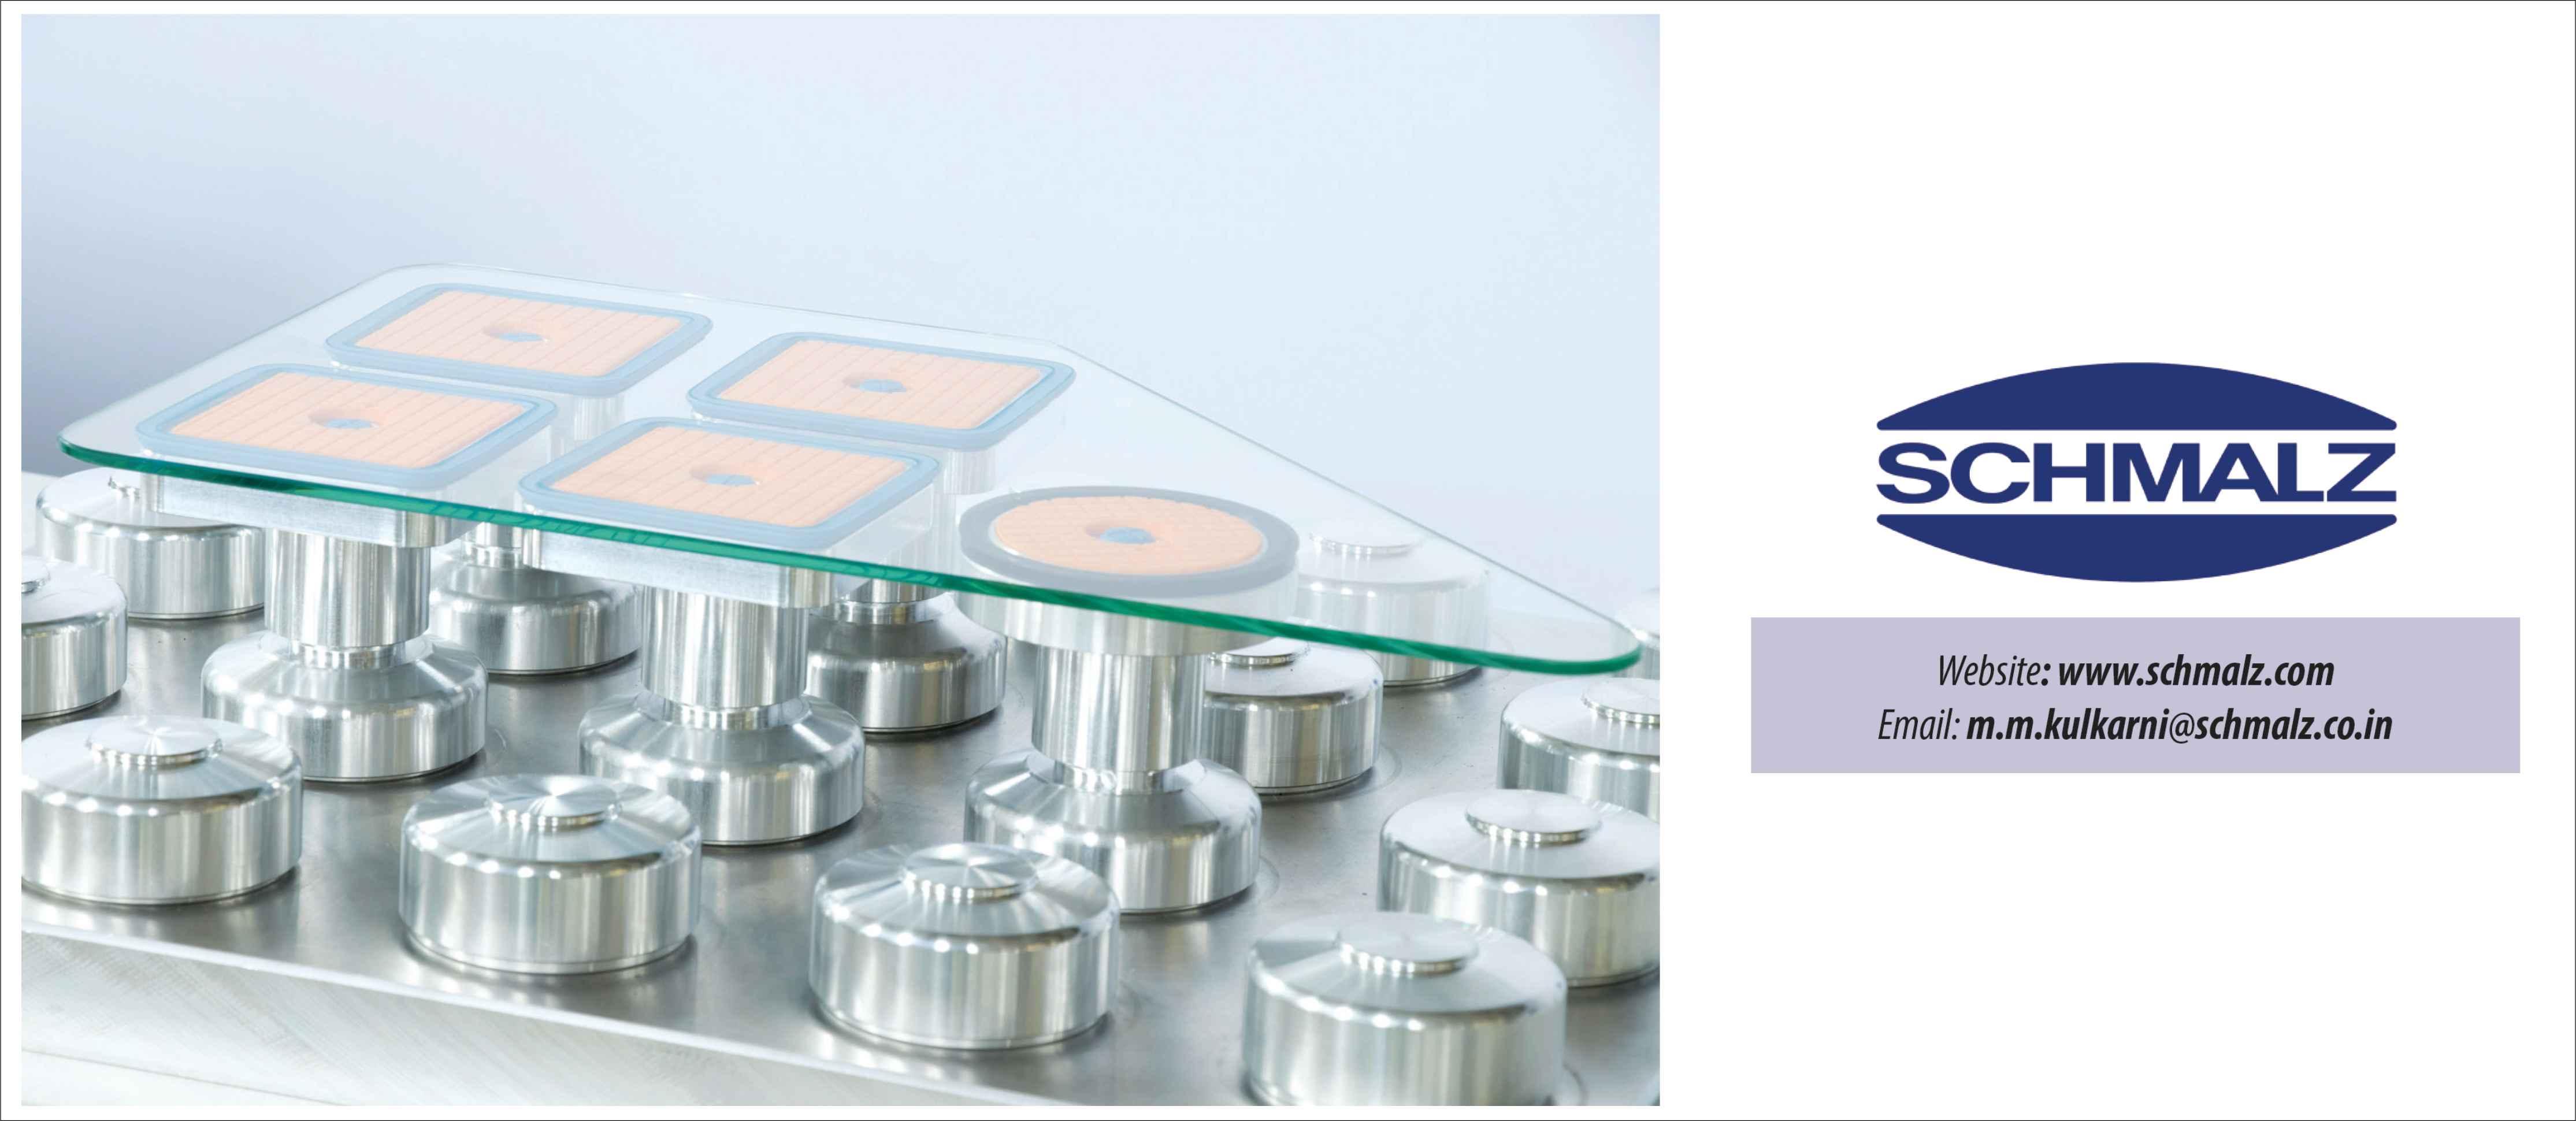 Schmalz optimises vacuum clamping system for glass machining